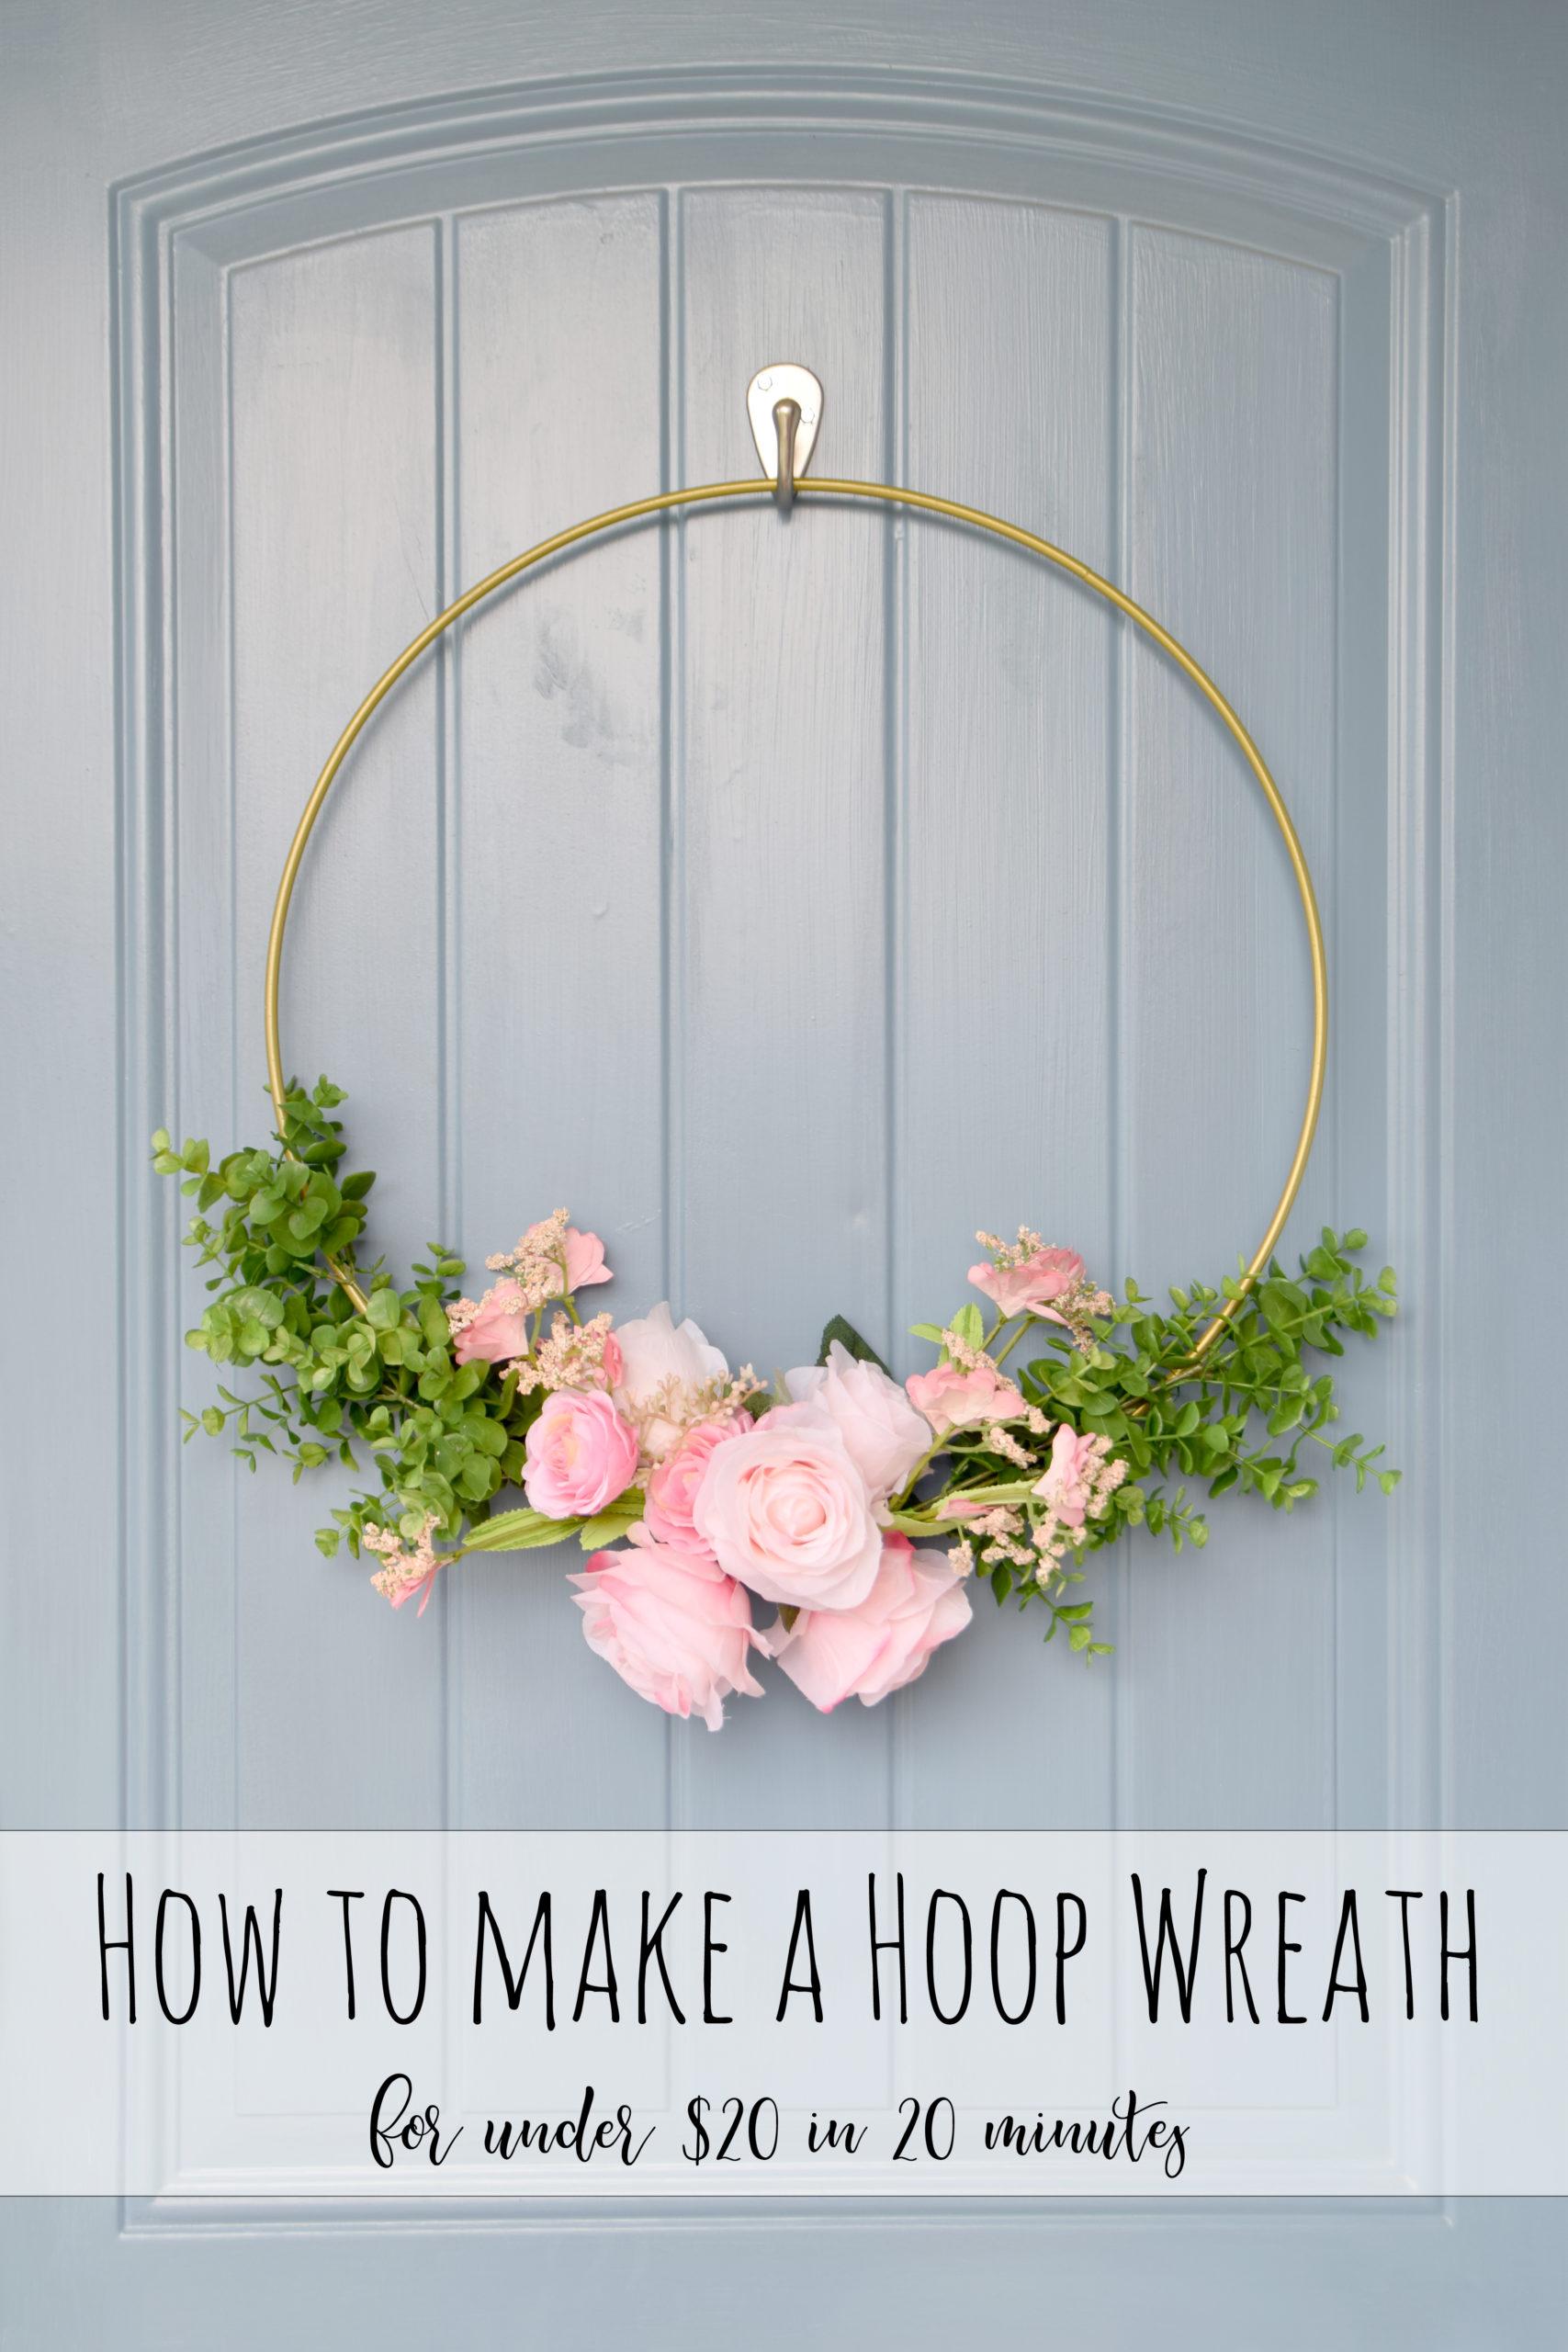 How to Make a Hoop Wreath